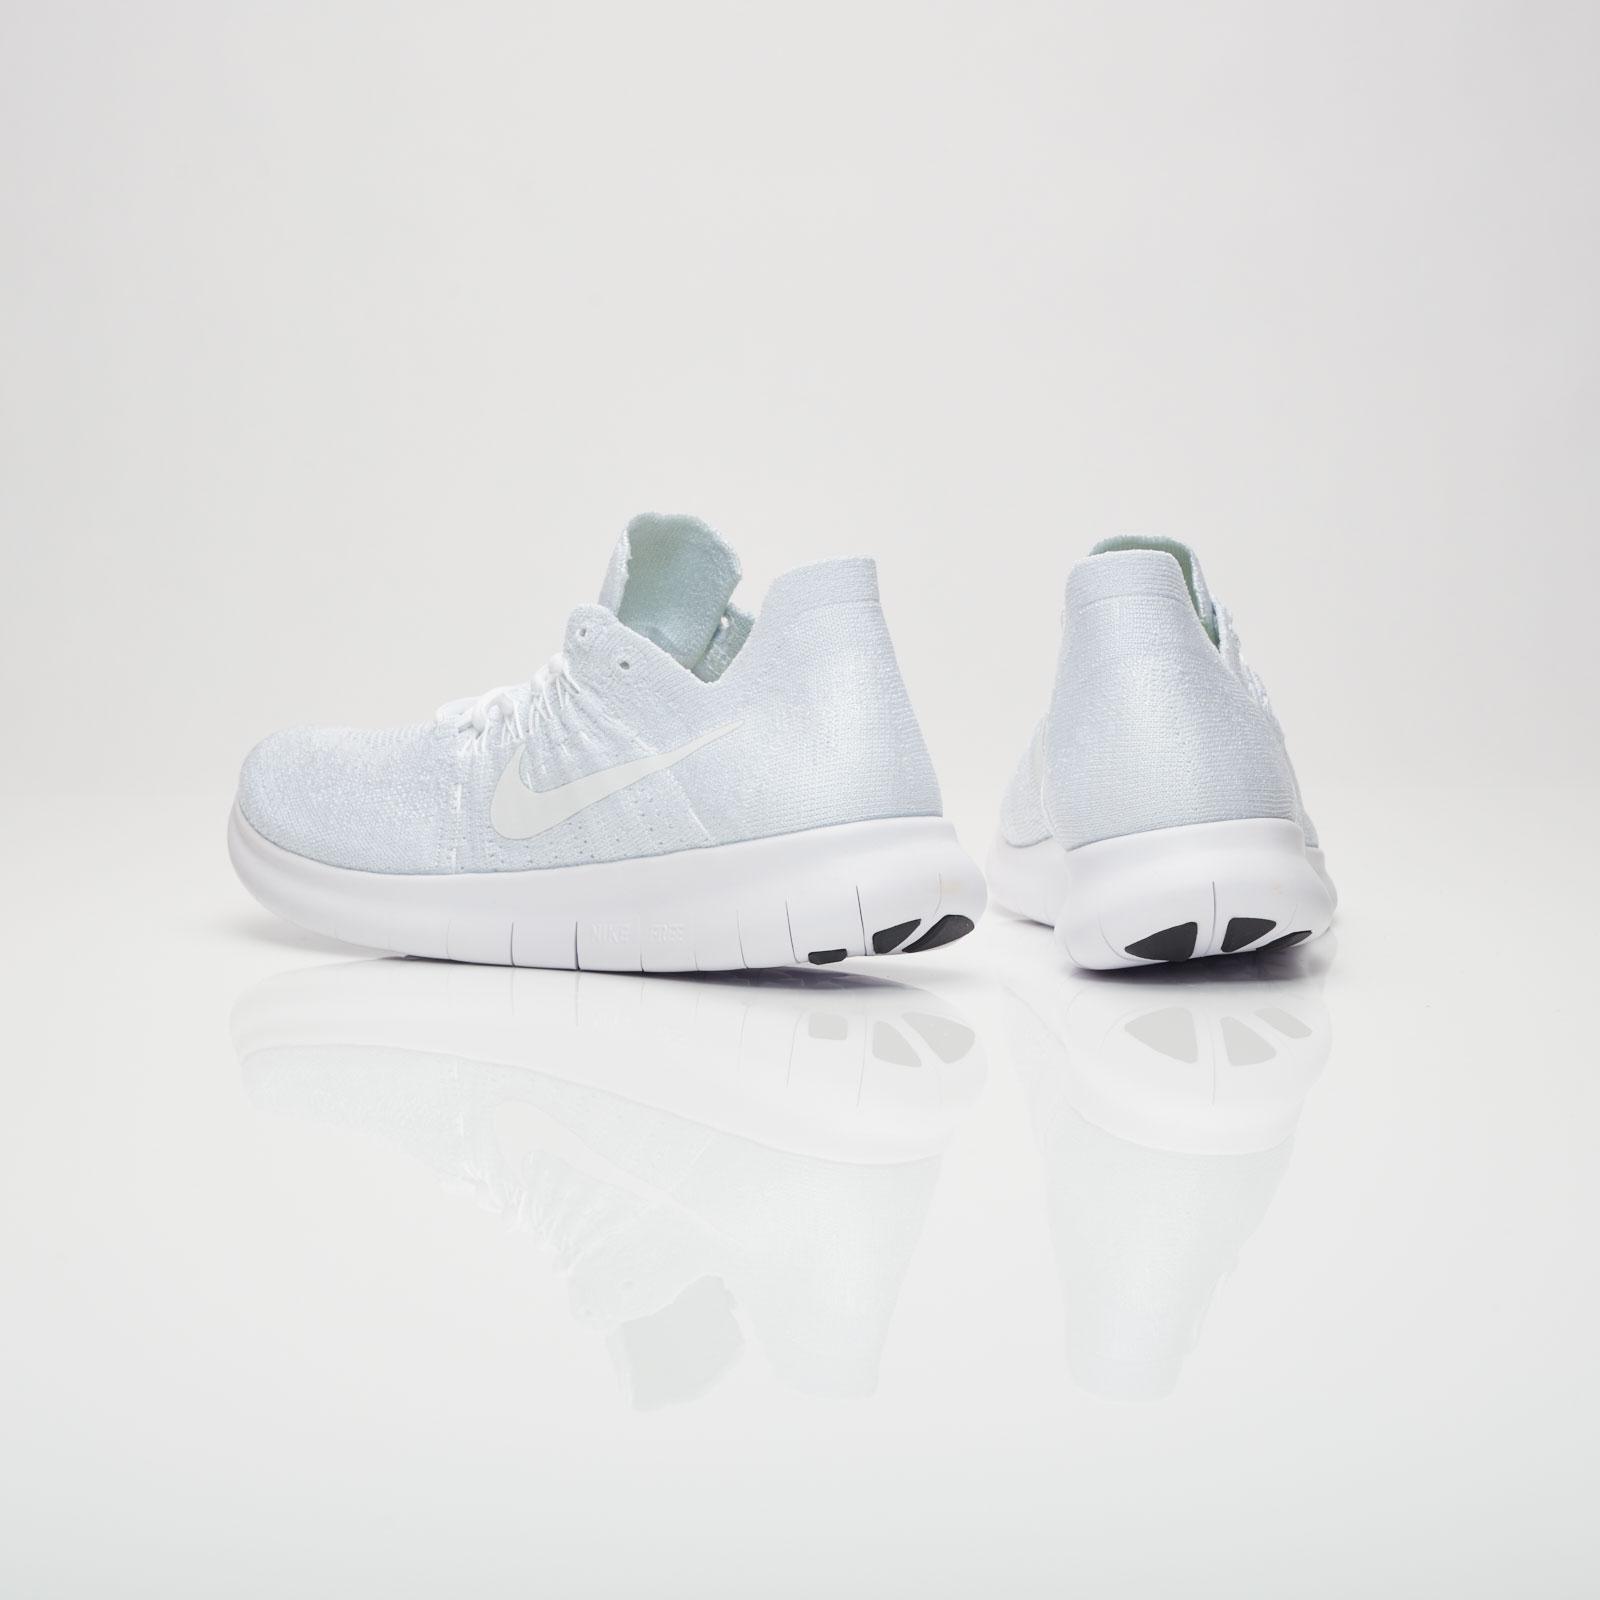 990090af82c03 Nike Wmns Free RN Flyknit 2017 - 880844-100 - Sneakersnstuff ...